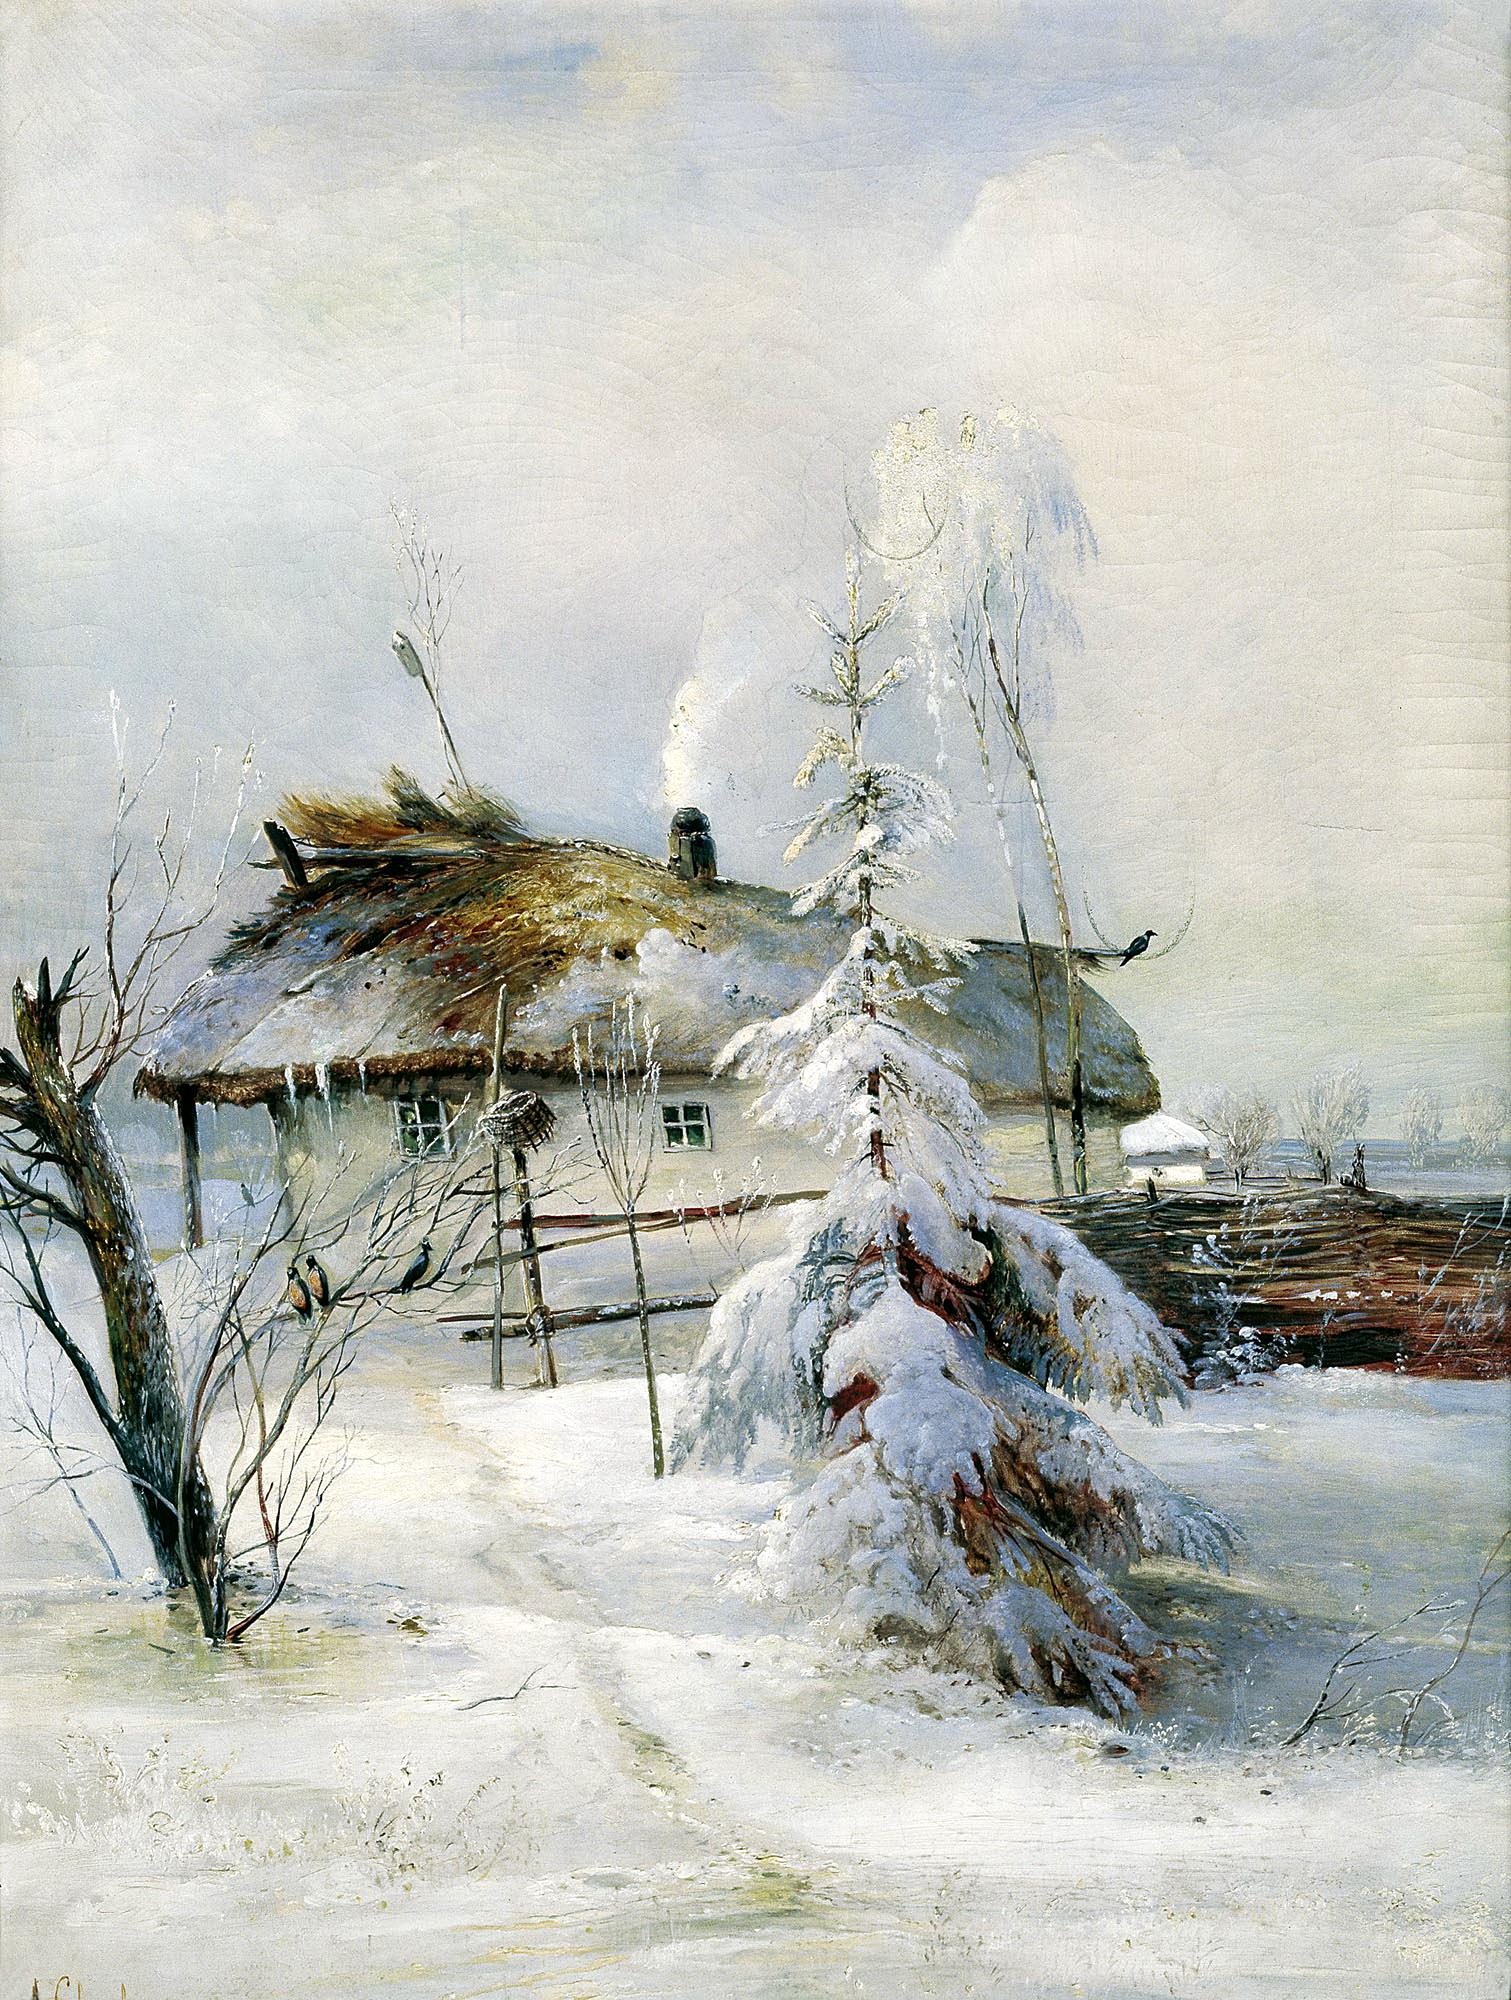 САВРАСОВ Алексей - Зима